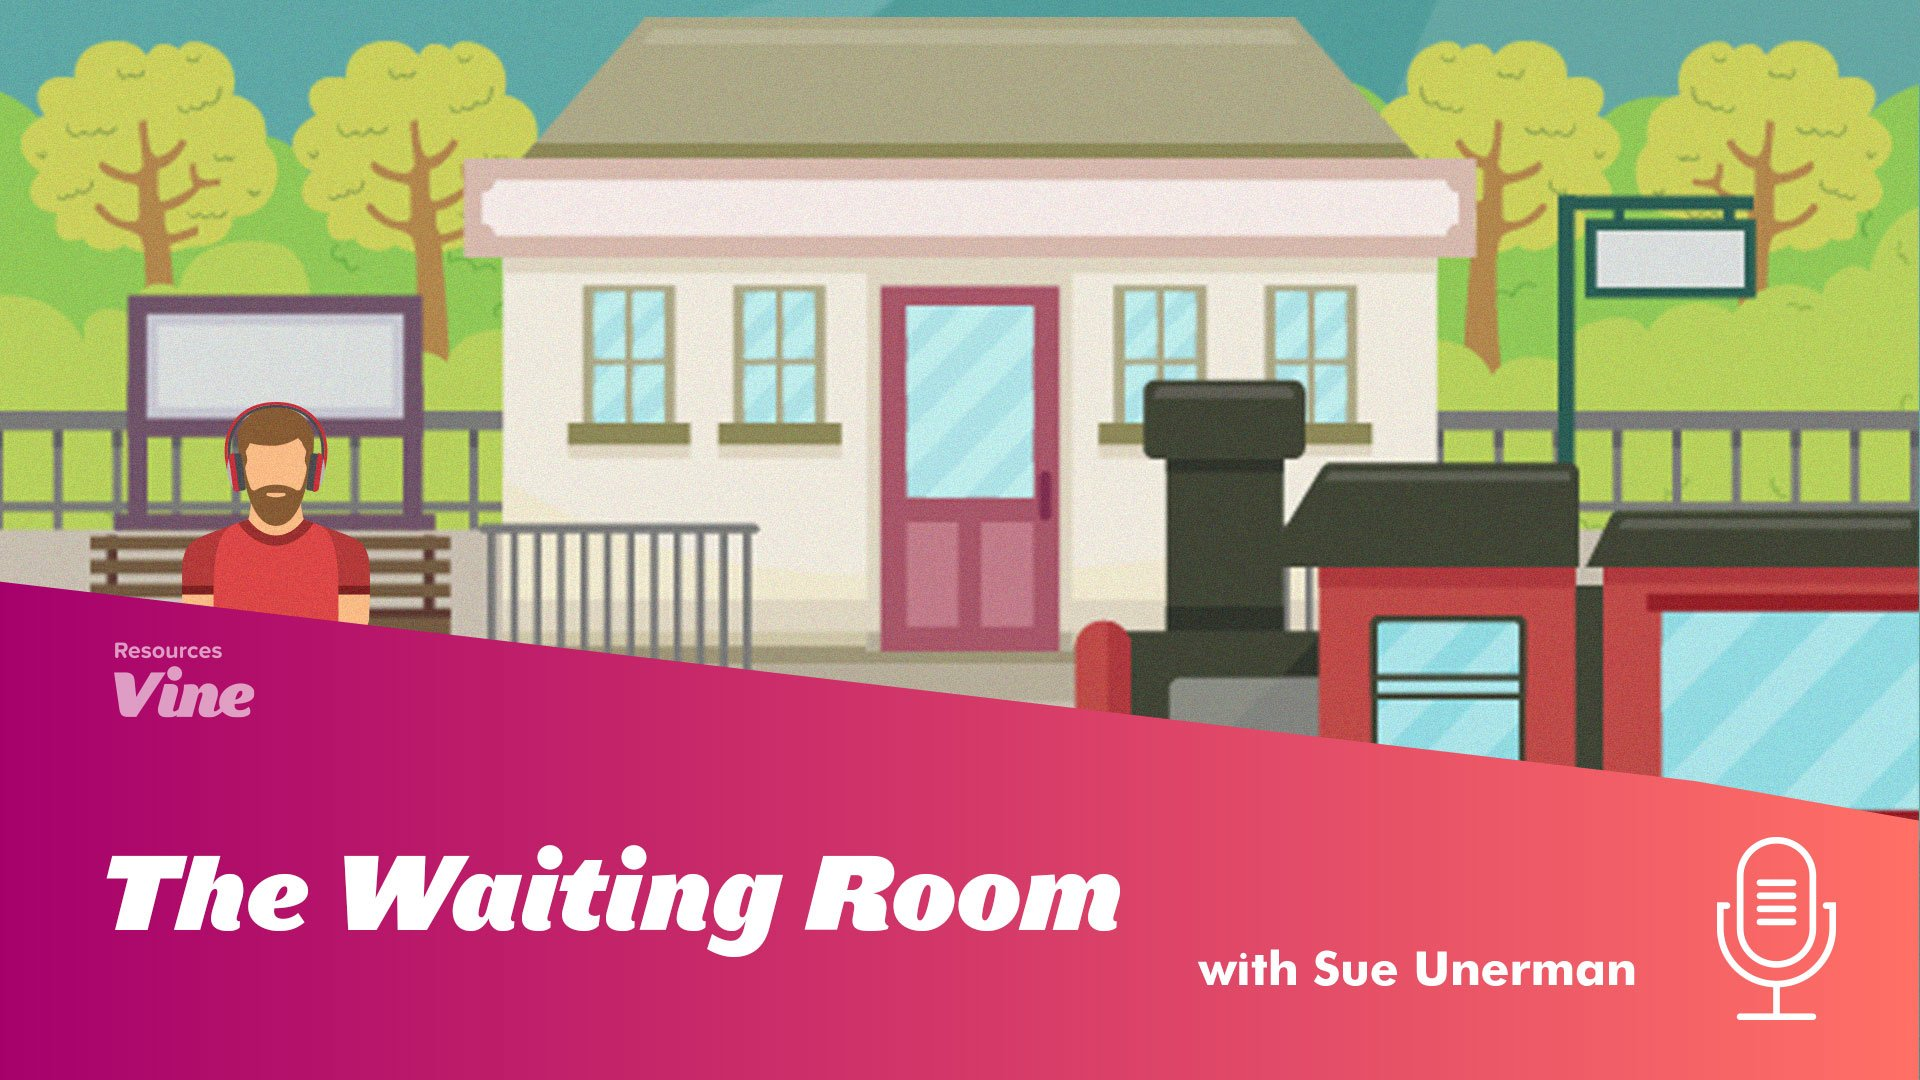 Thumbnail_The_Waiting_Room_SU